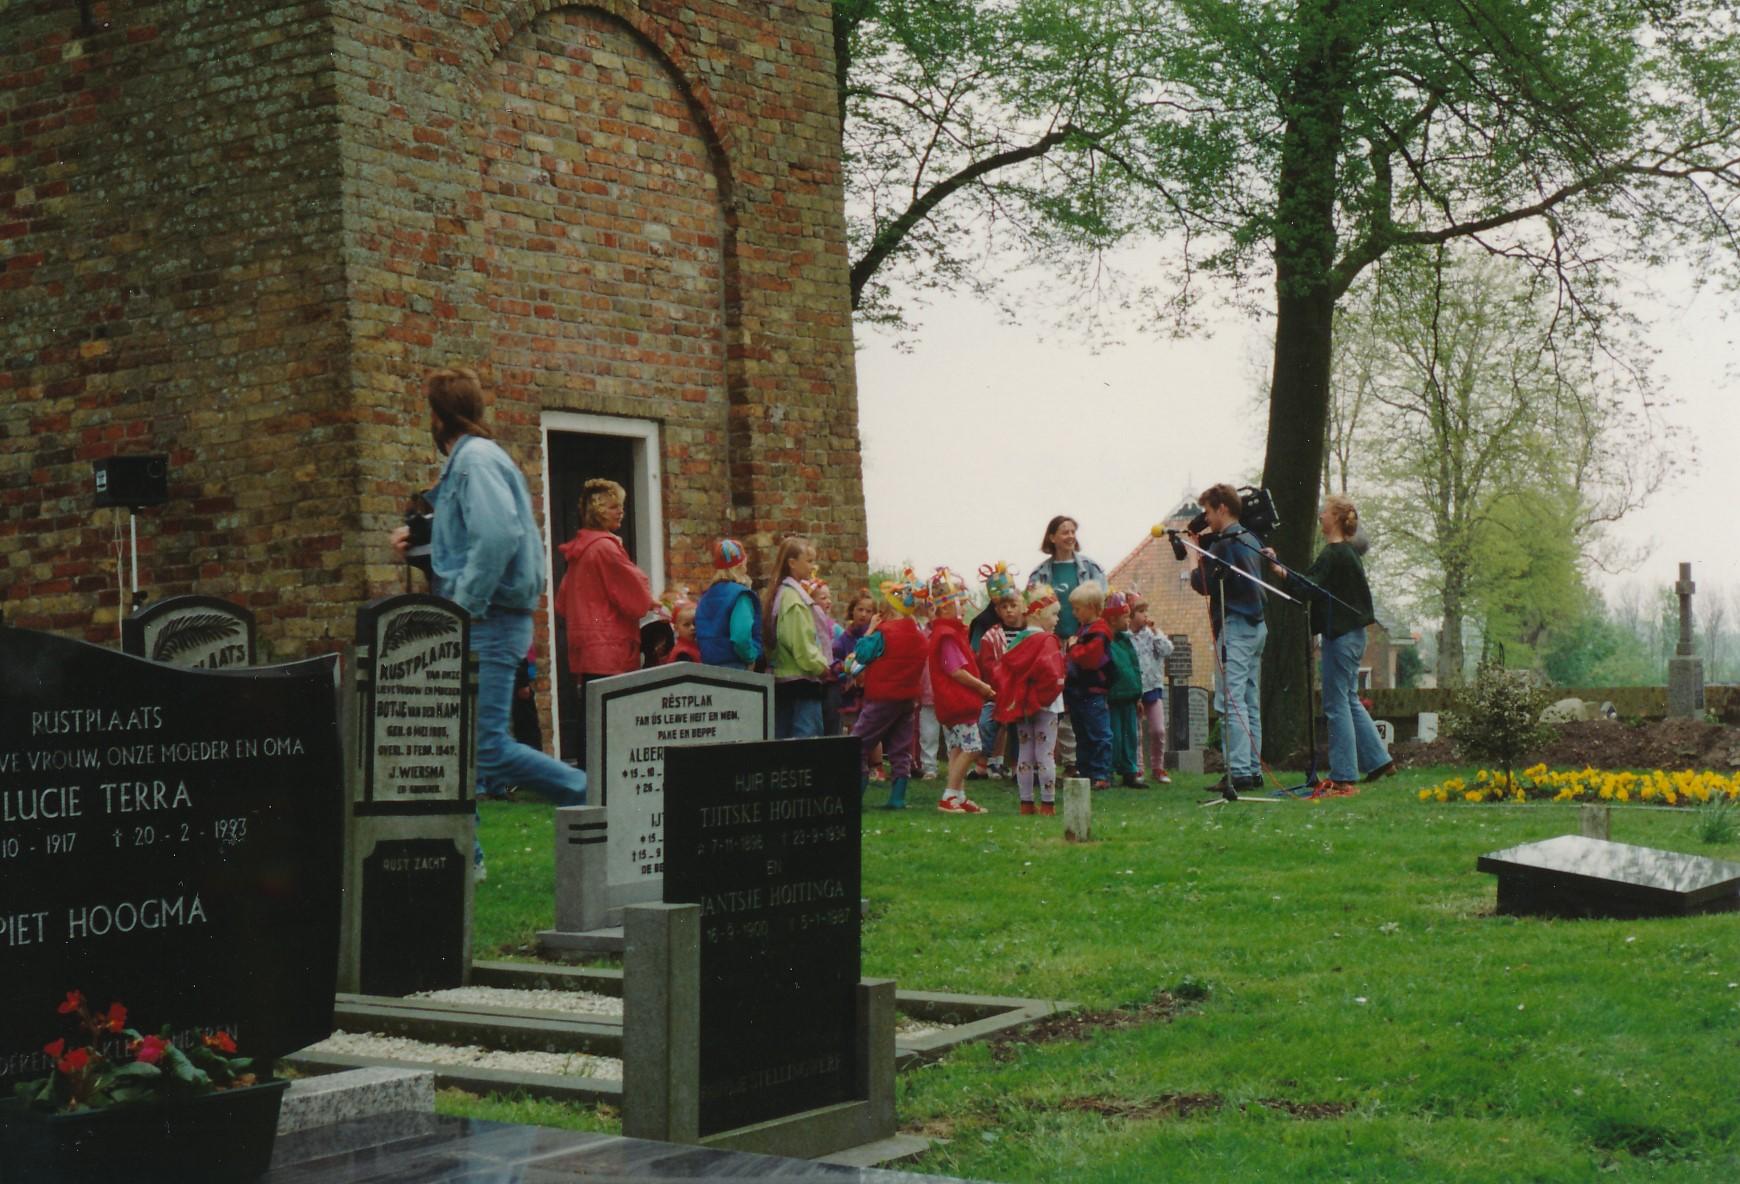 Fotoalbum Anneke Miedema, 043, Iepening klok Ald Toer, 1994